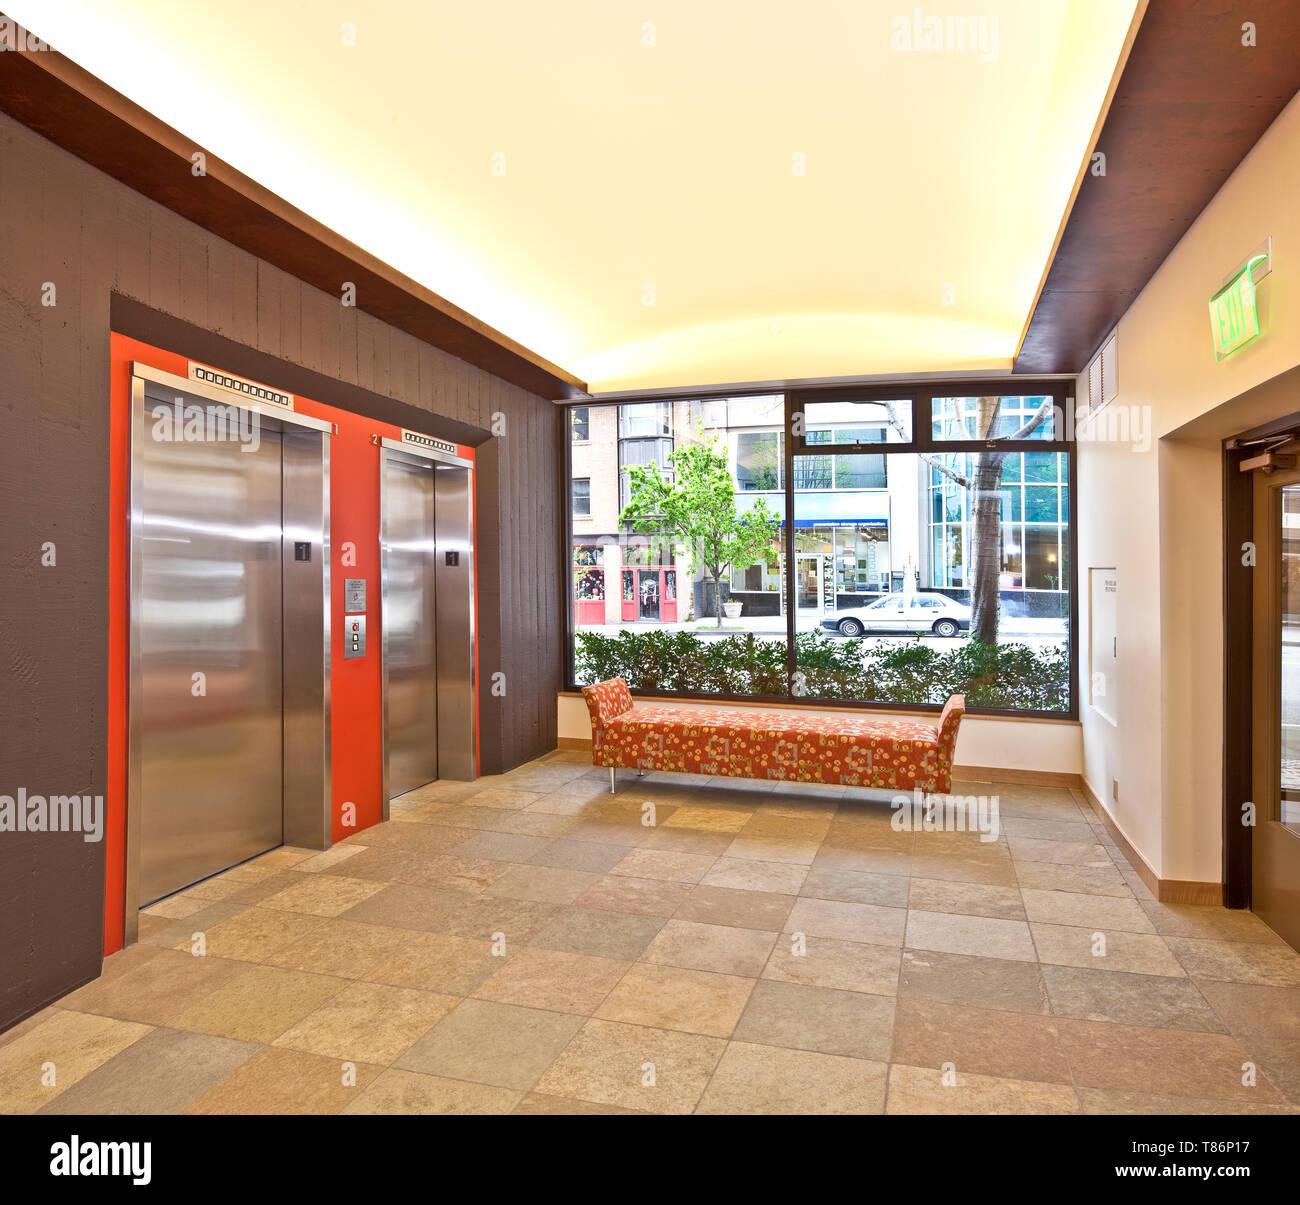 Modern Office Building Lobby Stock Photo: 246011395 - Alamy